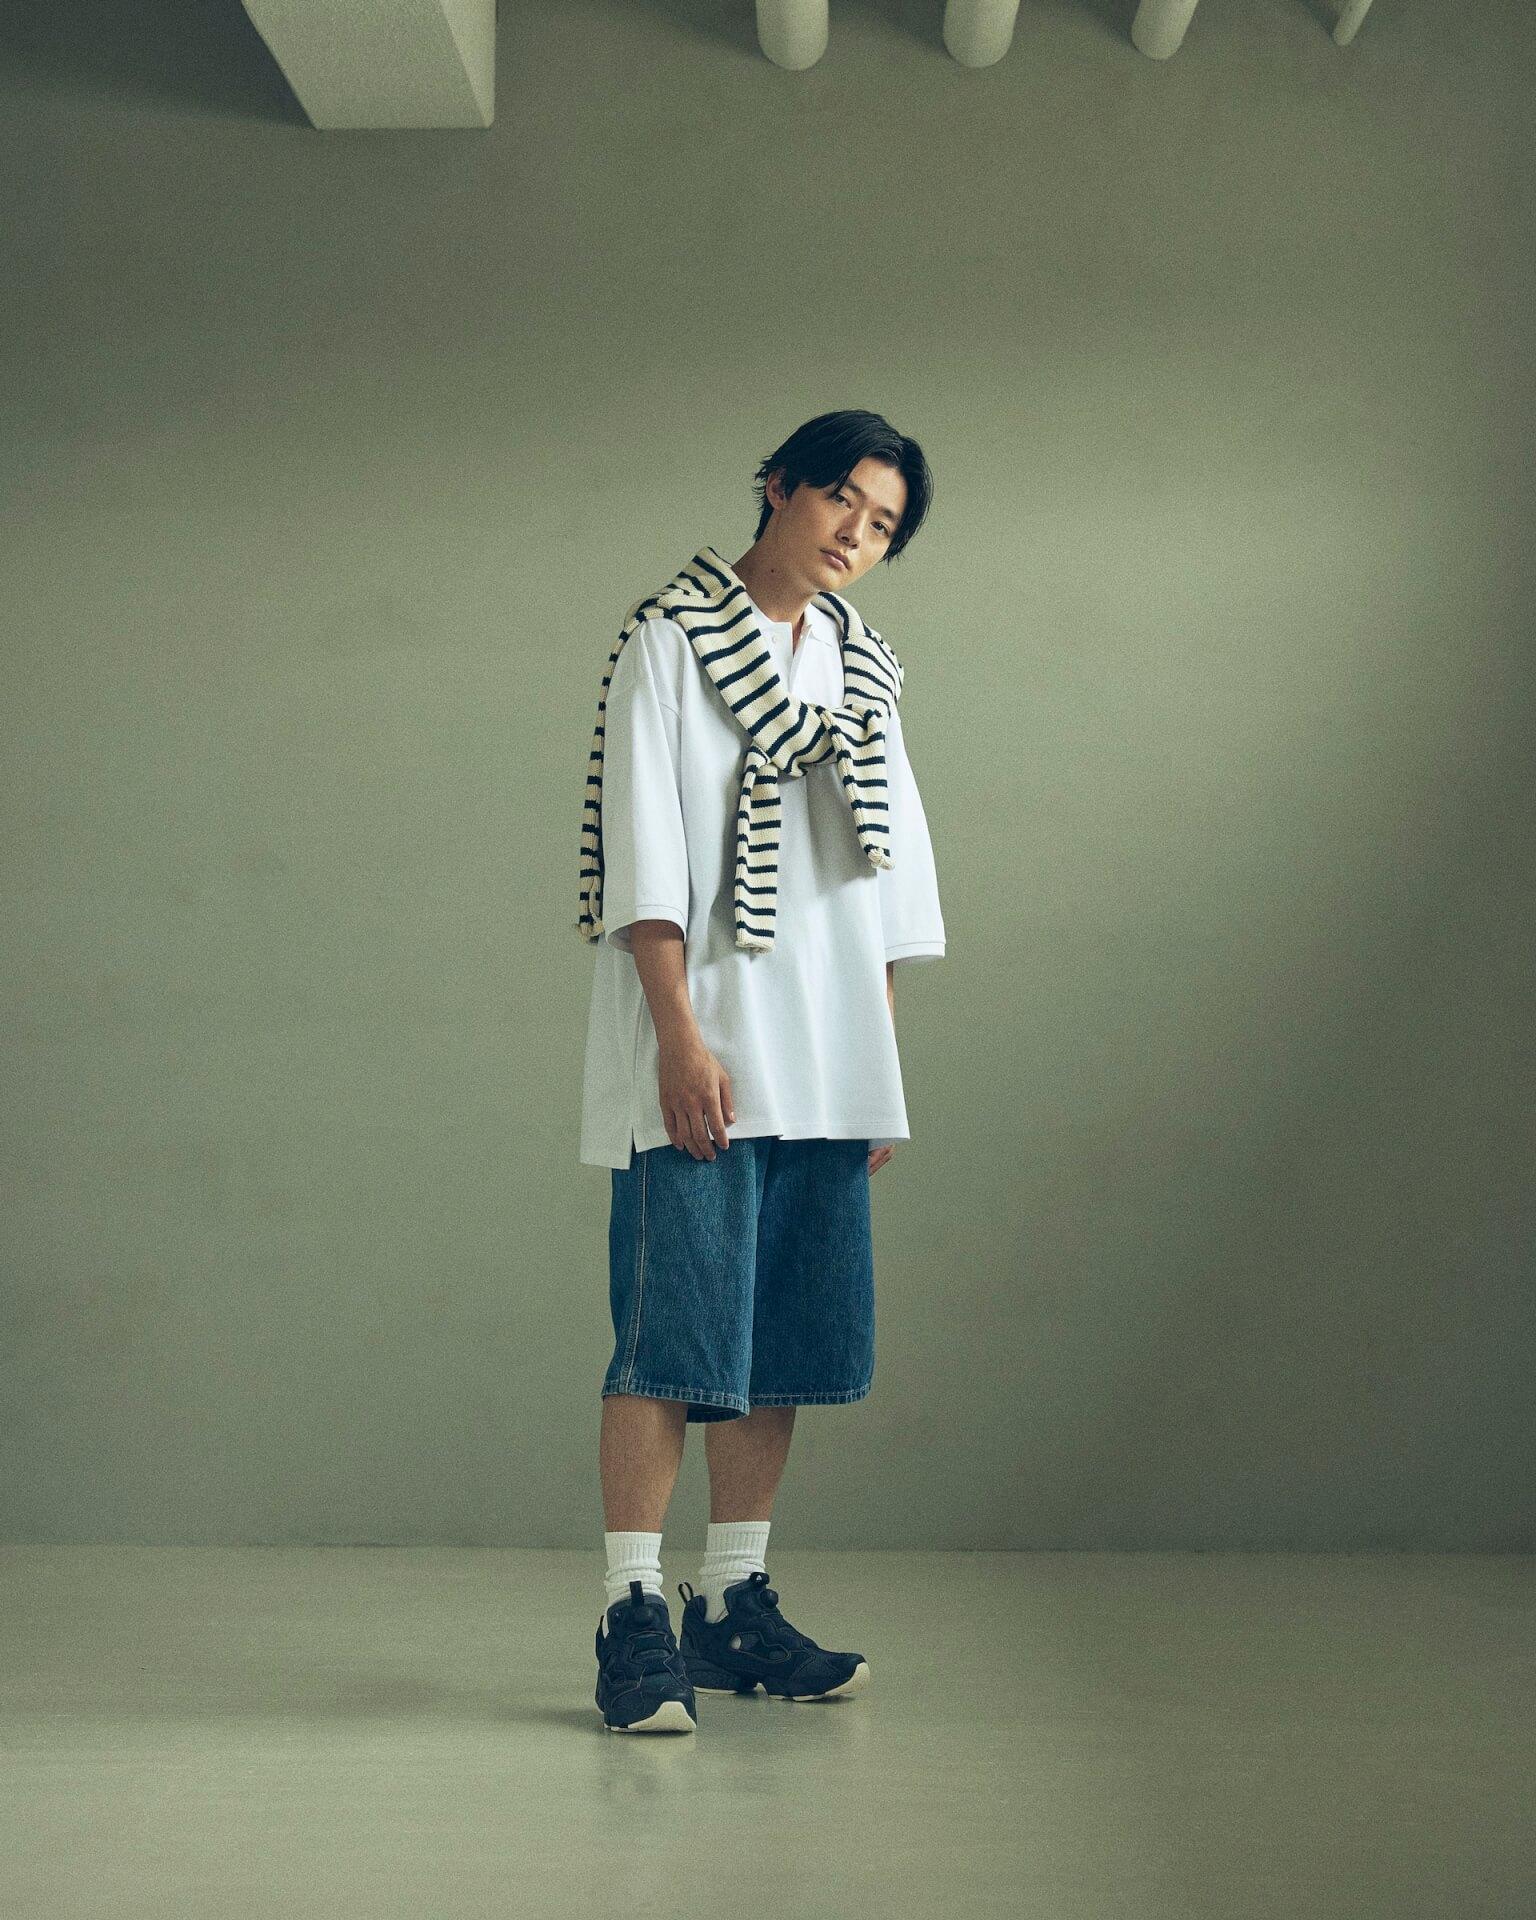 ReebokからリアルなデニムをイメージしたINSTAPUMP FURYの「DENIM PACK」が発売!櫻井海音とアンジュルム佐々木莉佳子がルックに登場 Fashion_210719_denimpack15